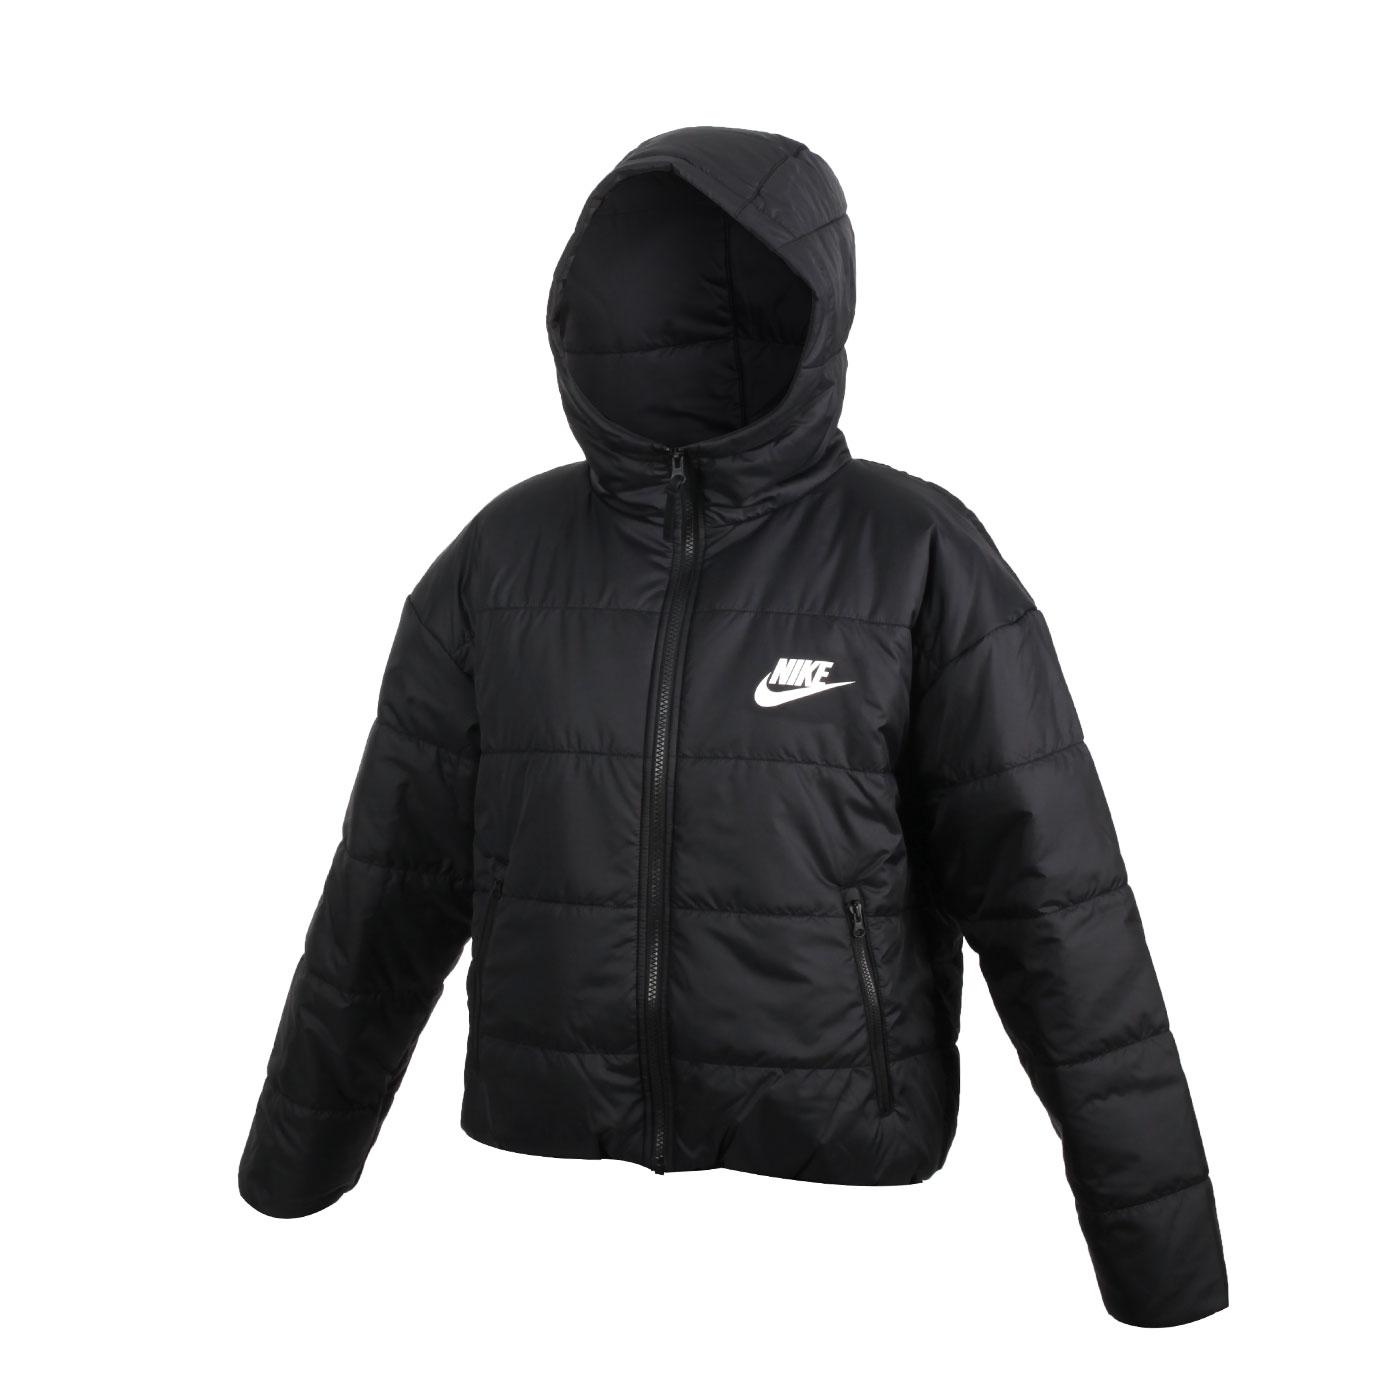 NIKE 女款保暖鋪棉防風連帽外套 CZ1467-010 - 黑白